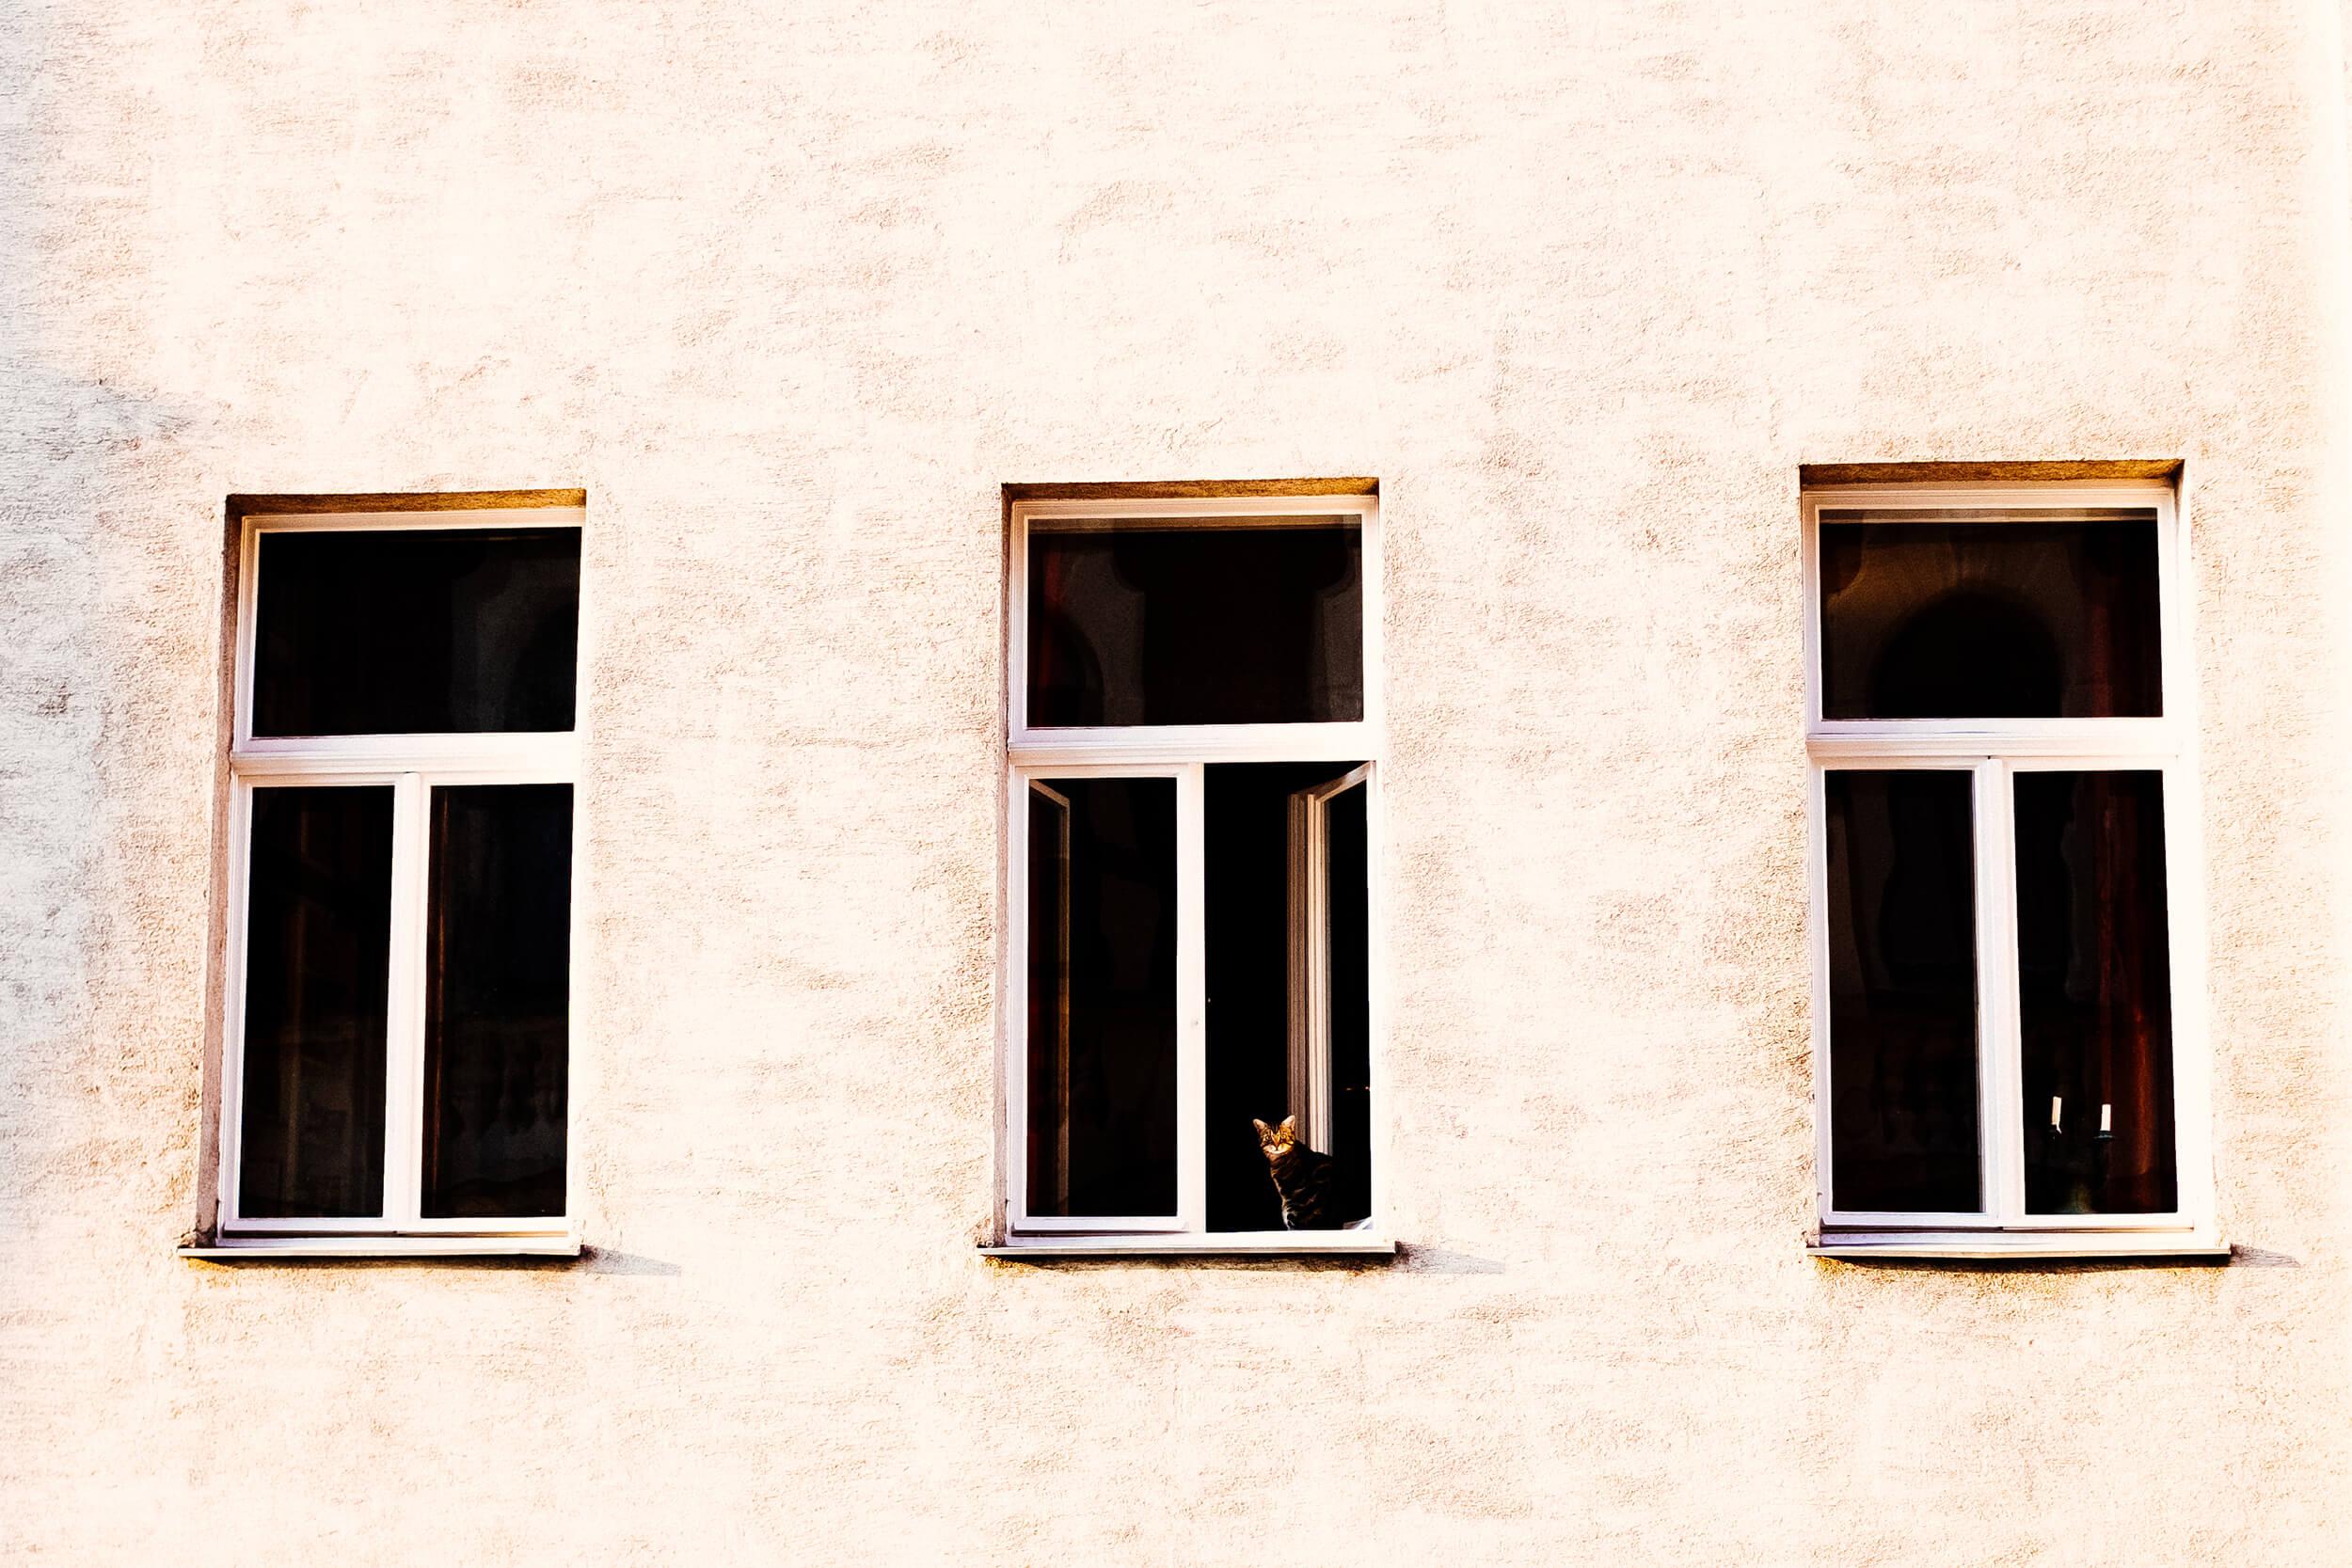 strangers-windows-cat-vienna.jpg